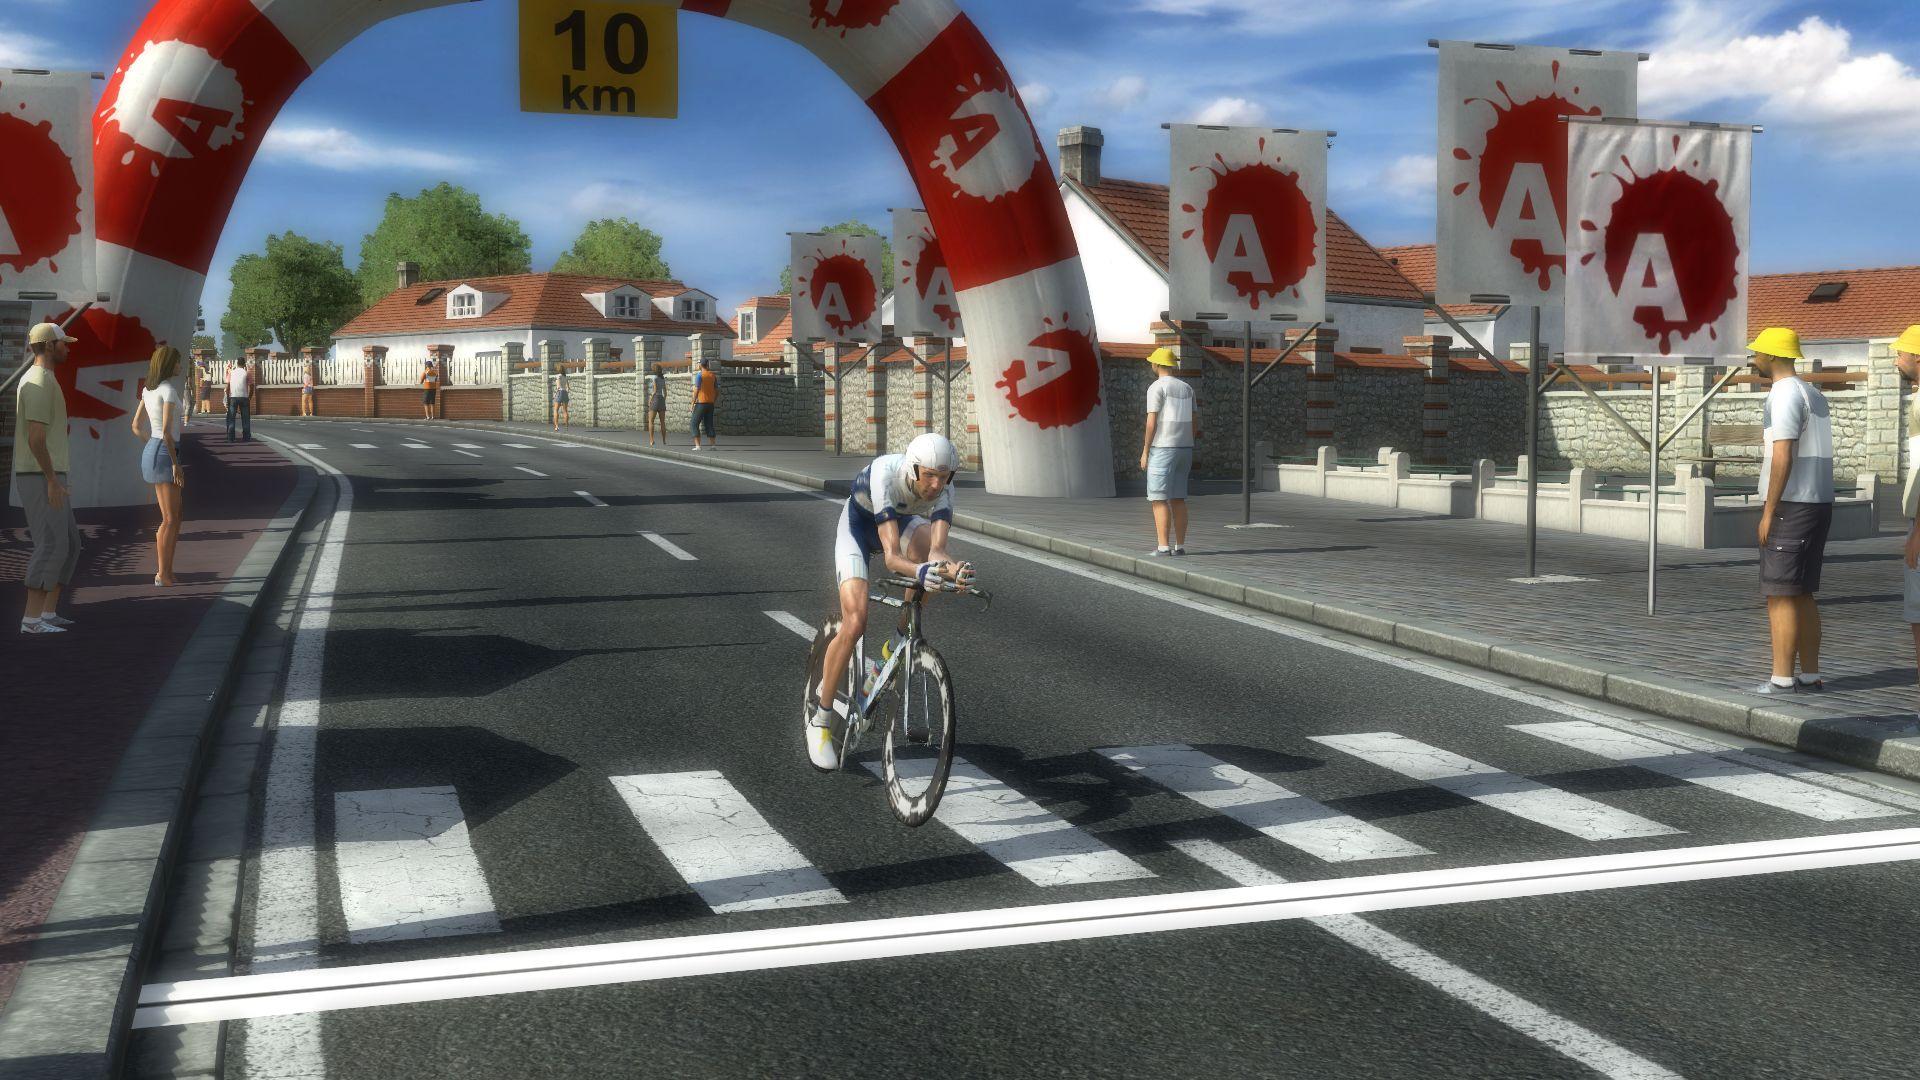 pcmdaily.com/images/mg/2019/Races/C1/Bayern/S4/mg19_bay_s04_45.jpg